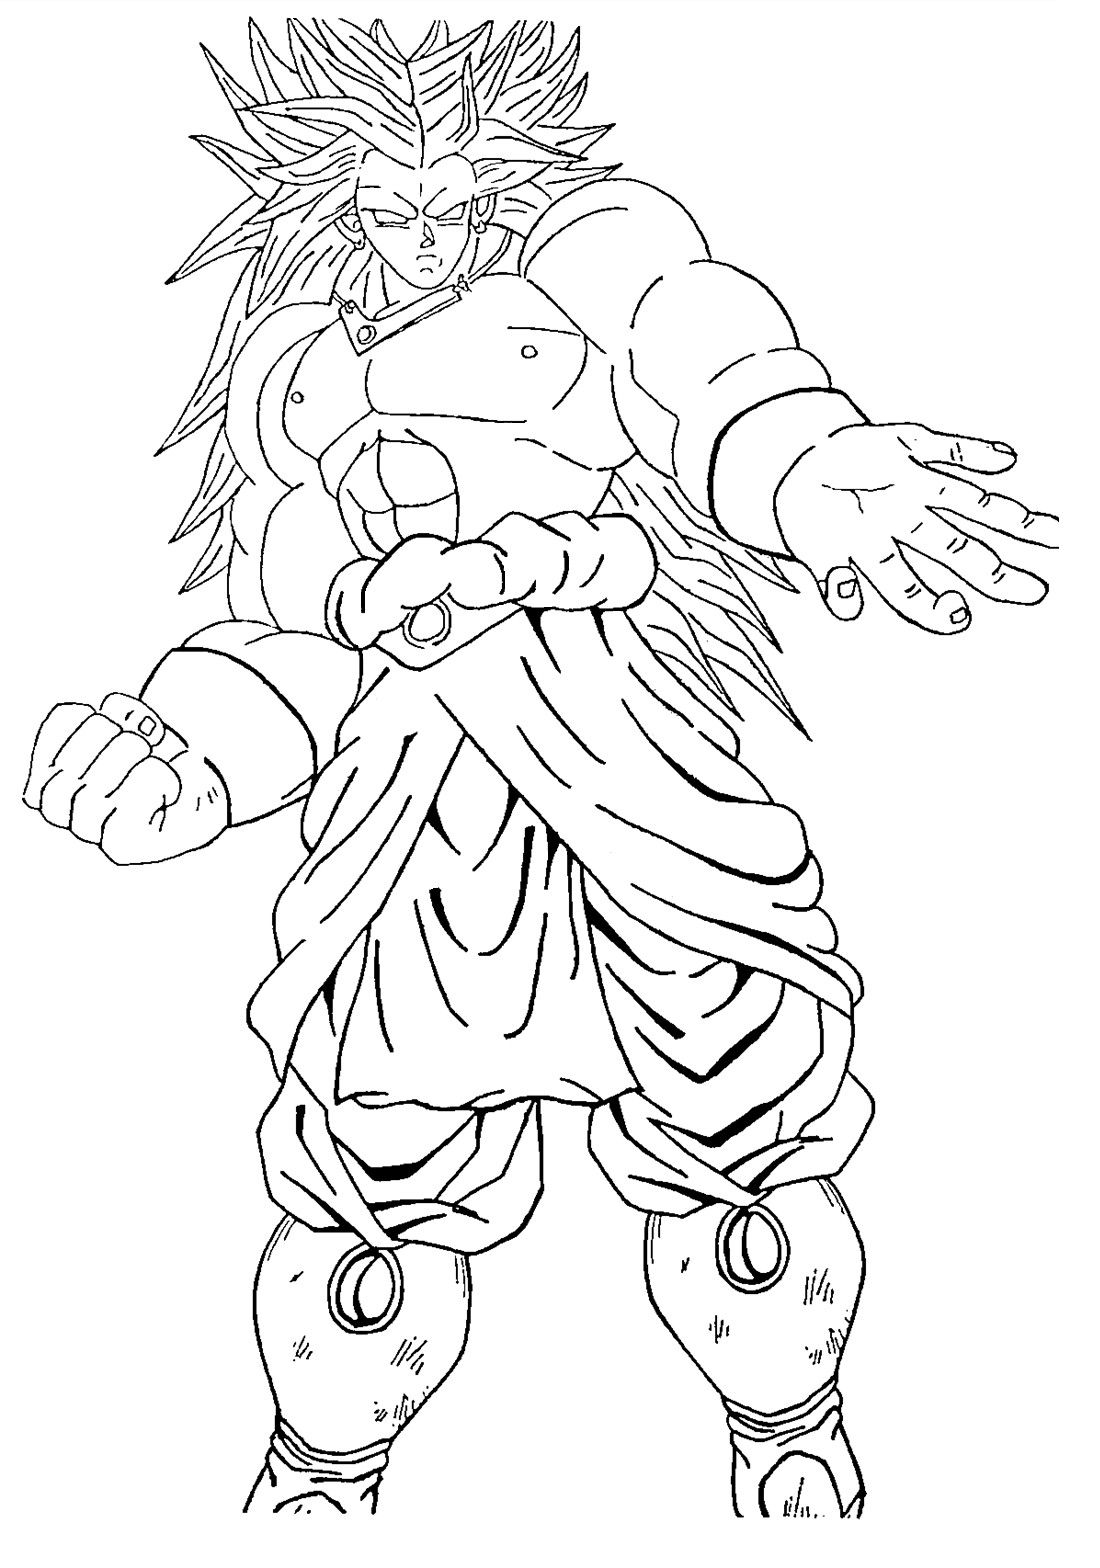 1100x1568 Broly Dragon Ball Goku And Striking Coloring Pages